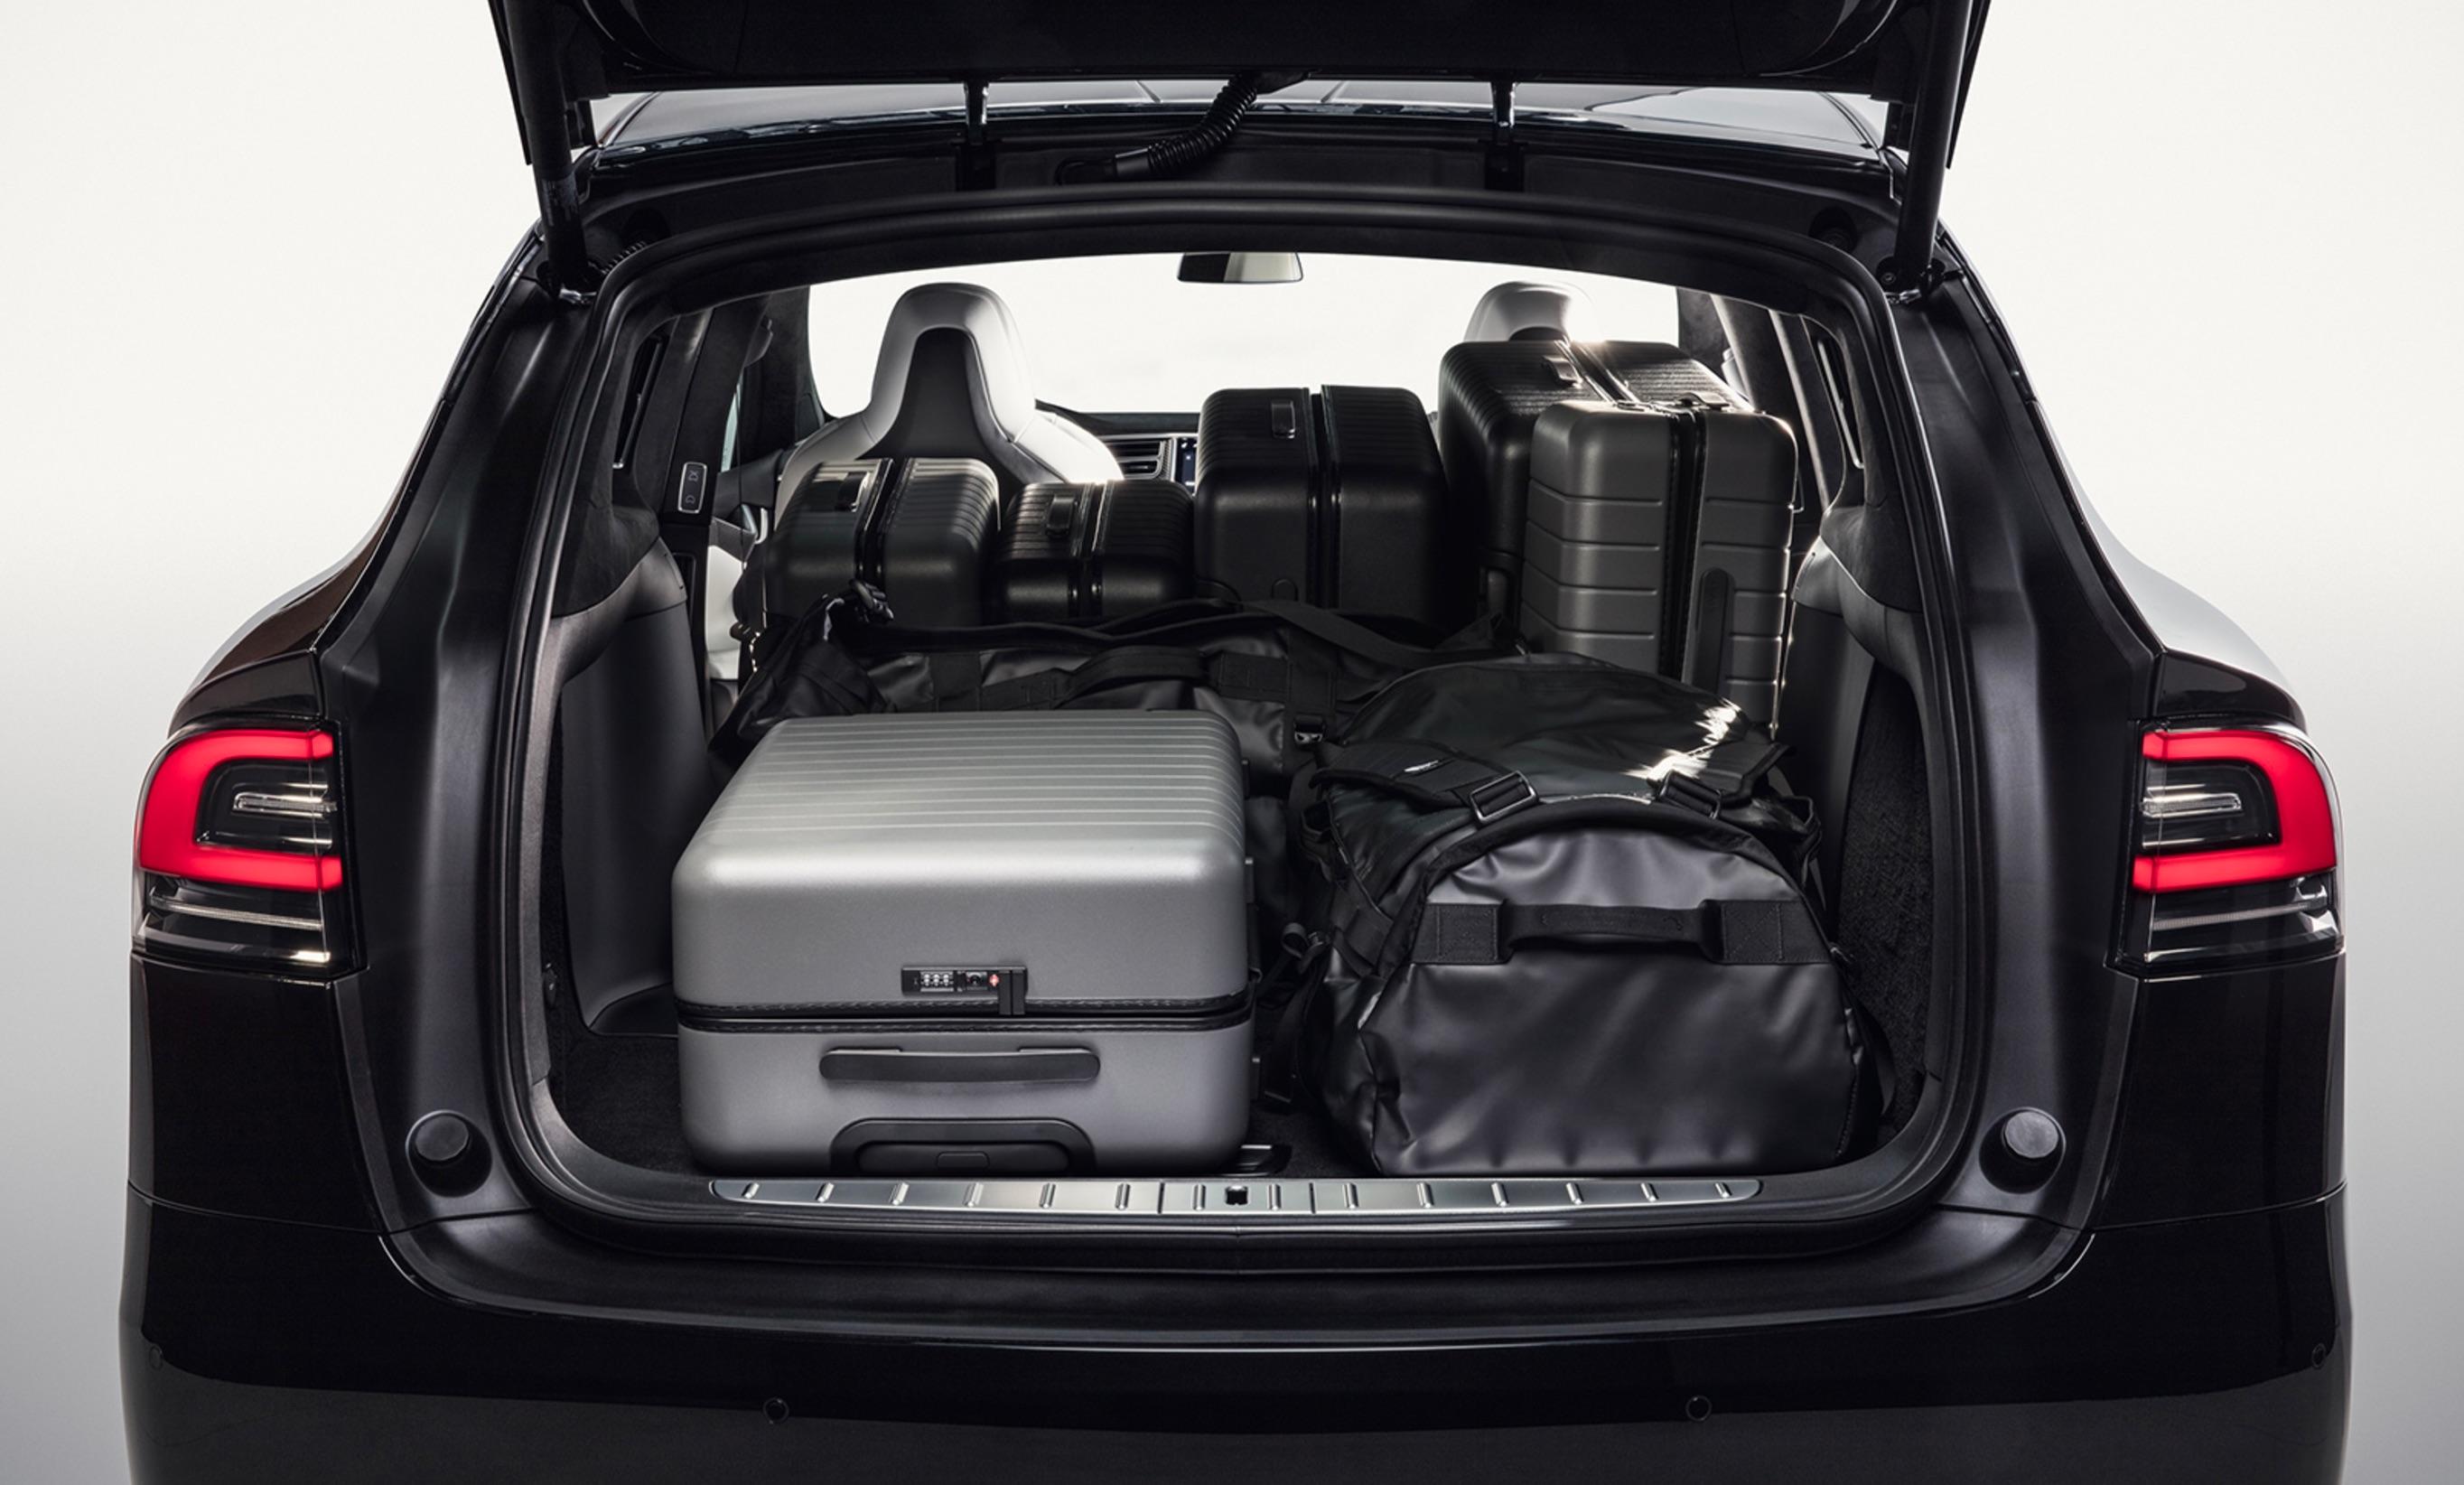 teszla-model-x-trunk-cargo-capacity